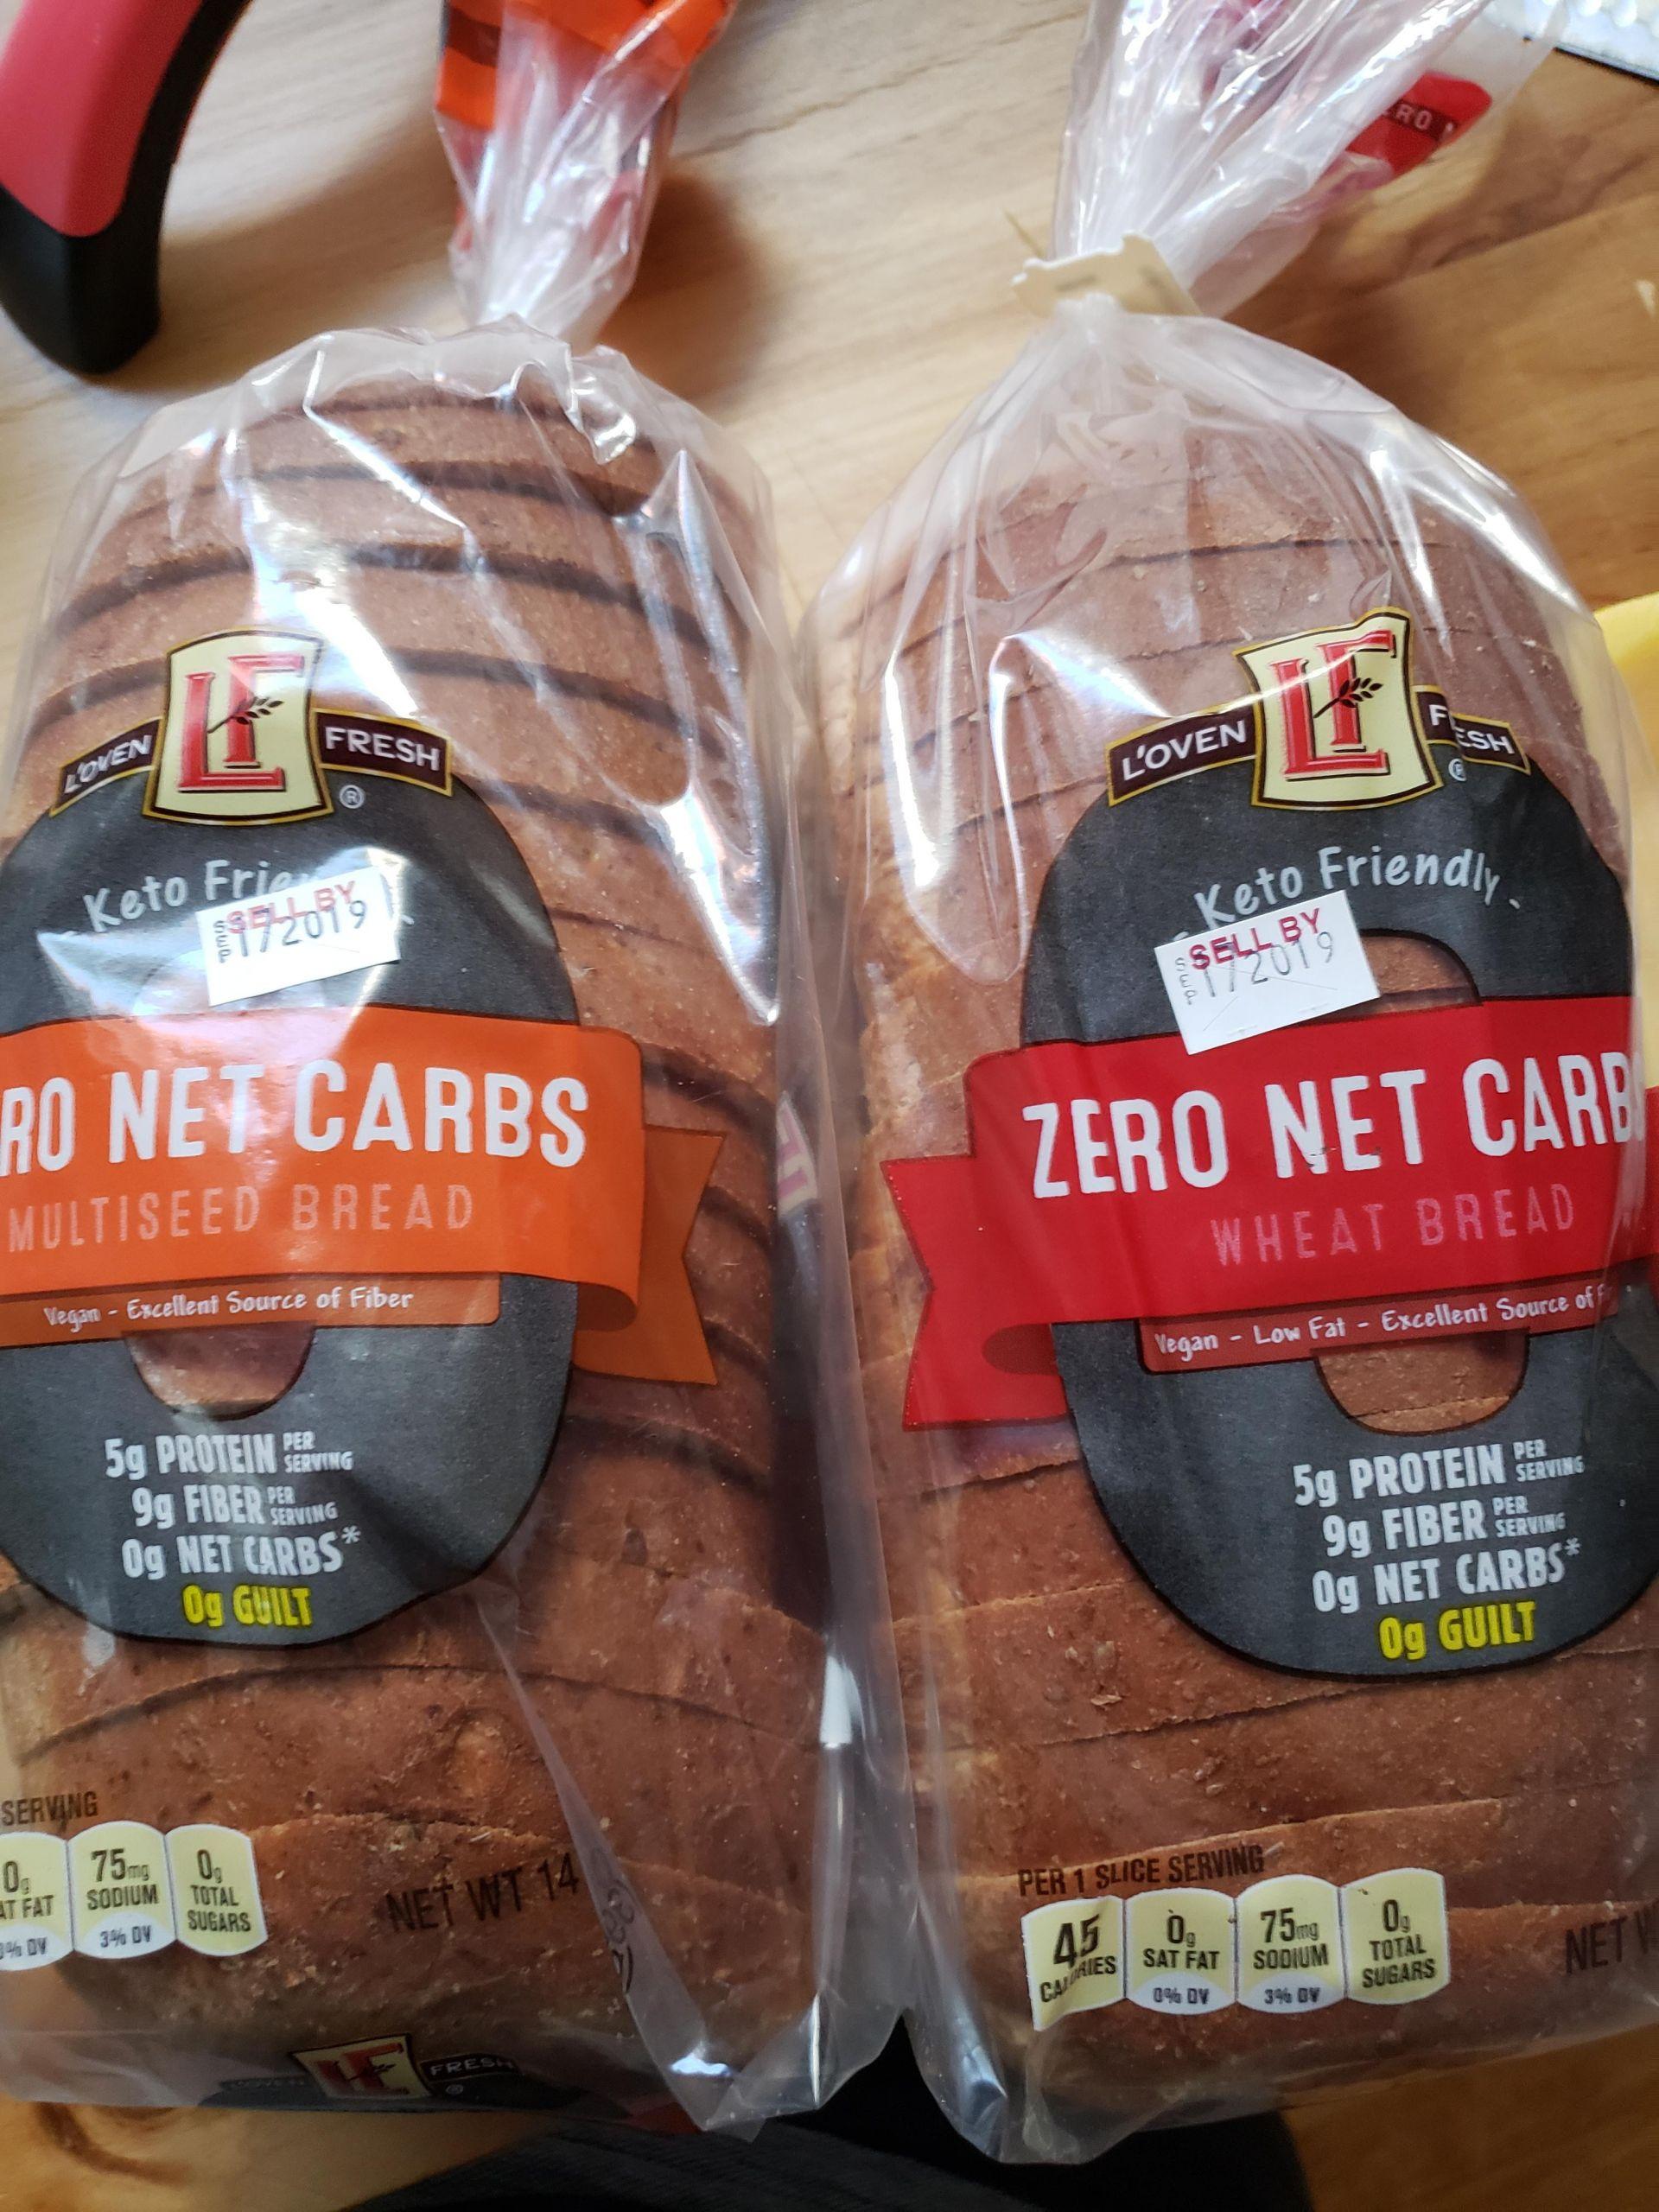 Low Carb Bread In Stores  Zero net carbs bread